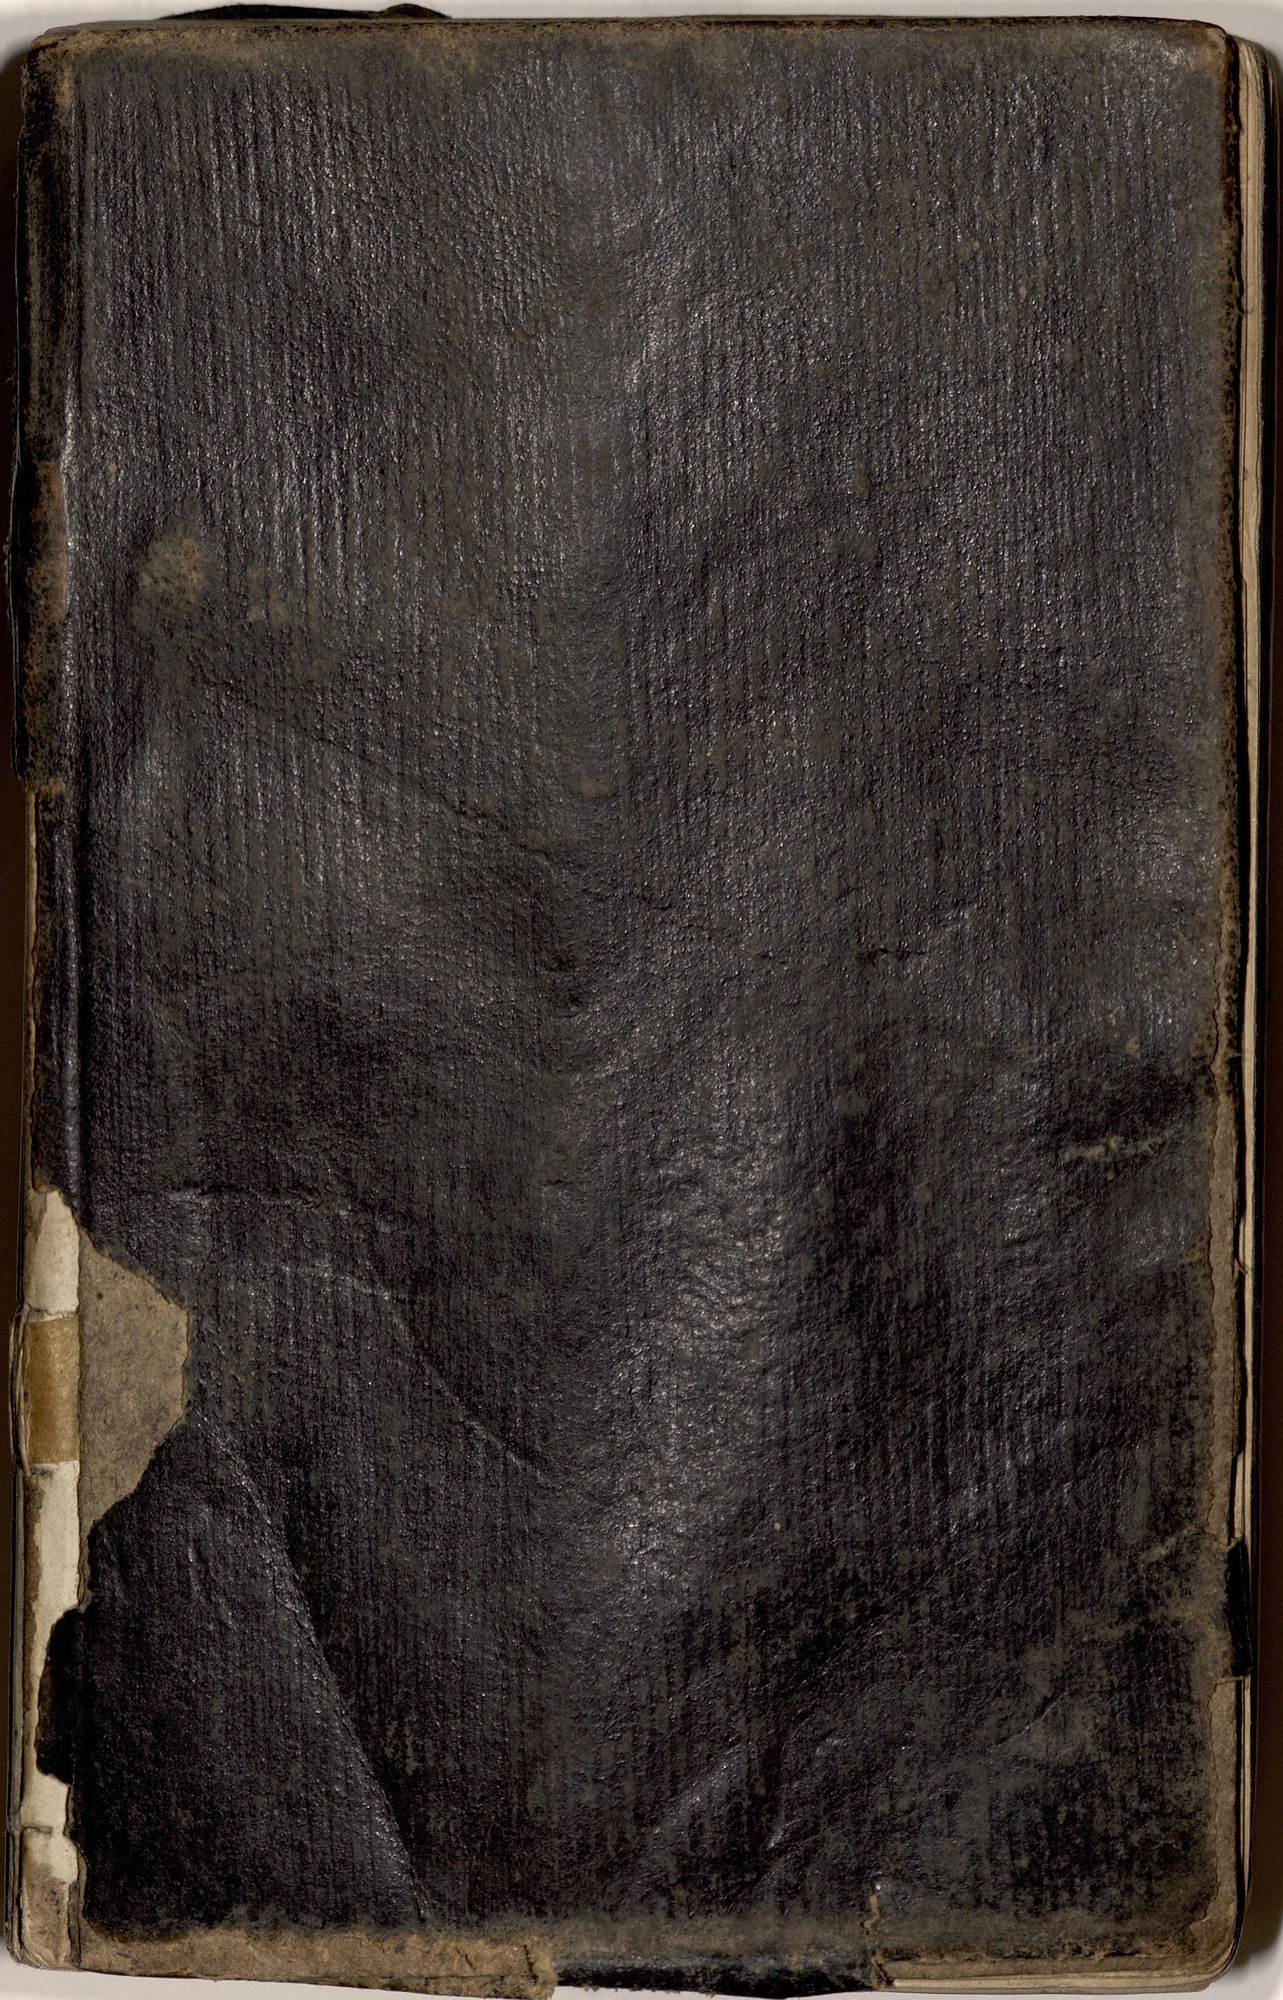 Ms2008-008_HancockJohnH_Diary_1862-1863_Frontcover.jpg